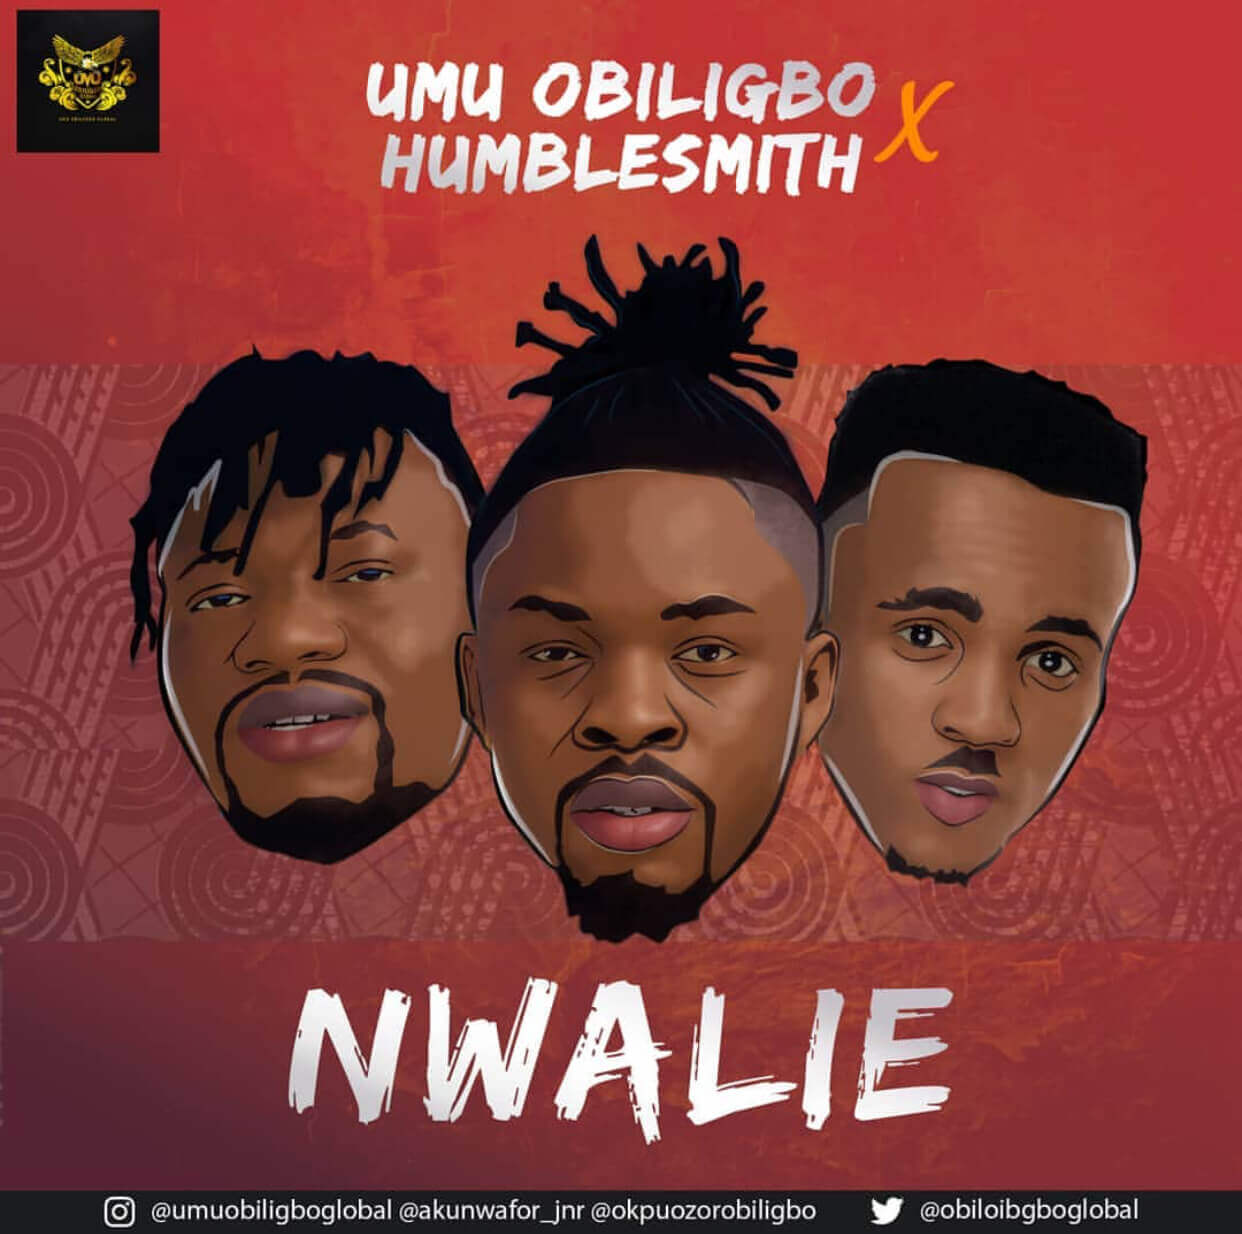 Umu Obiligbo - Nwalie ft. Humblesmith